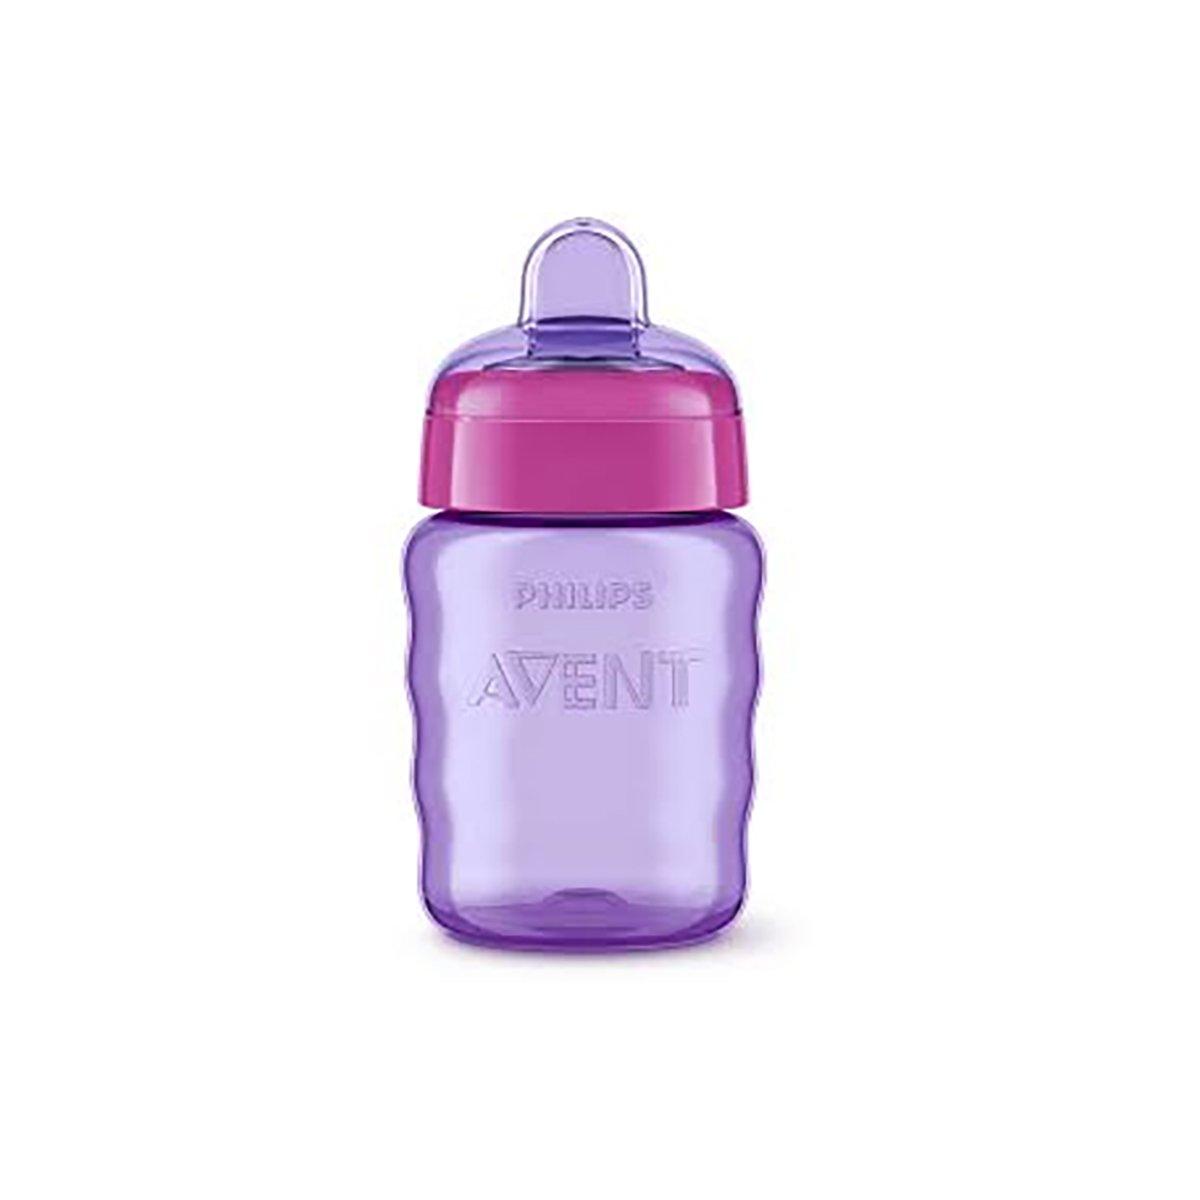 Cana bebe cu tetina de formare Philips Avent, 12 luni +, Mov imagine